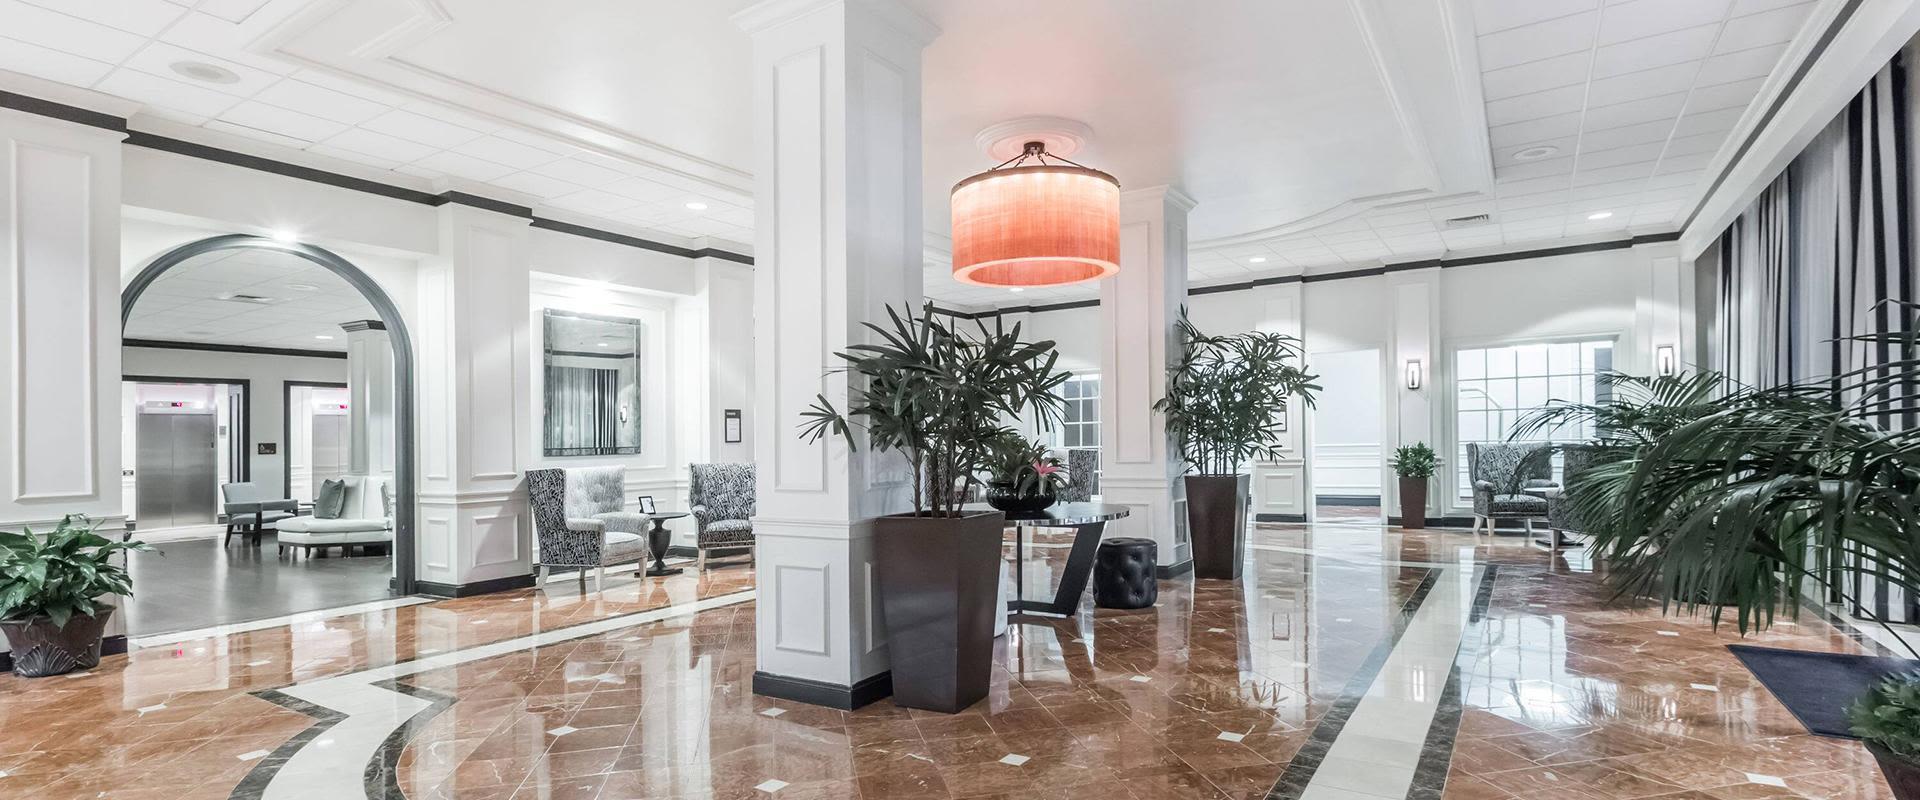 Modern hotel entrance and lobby